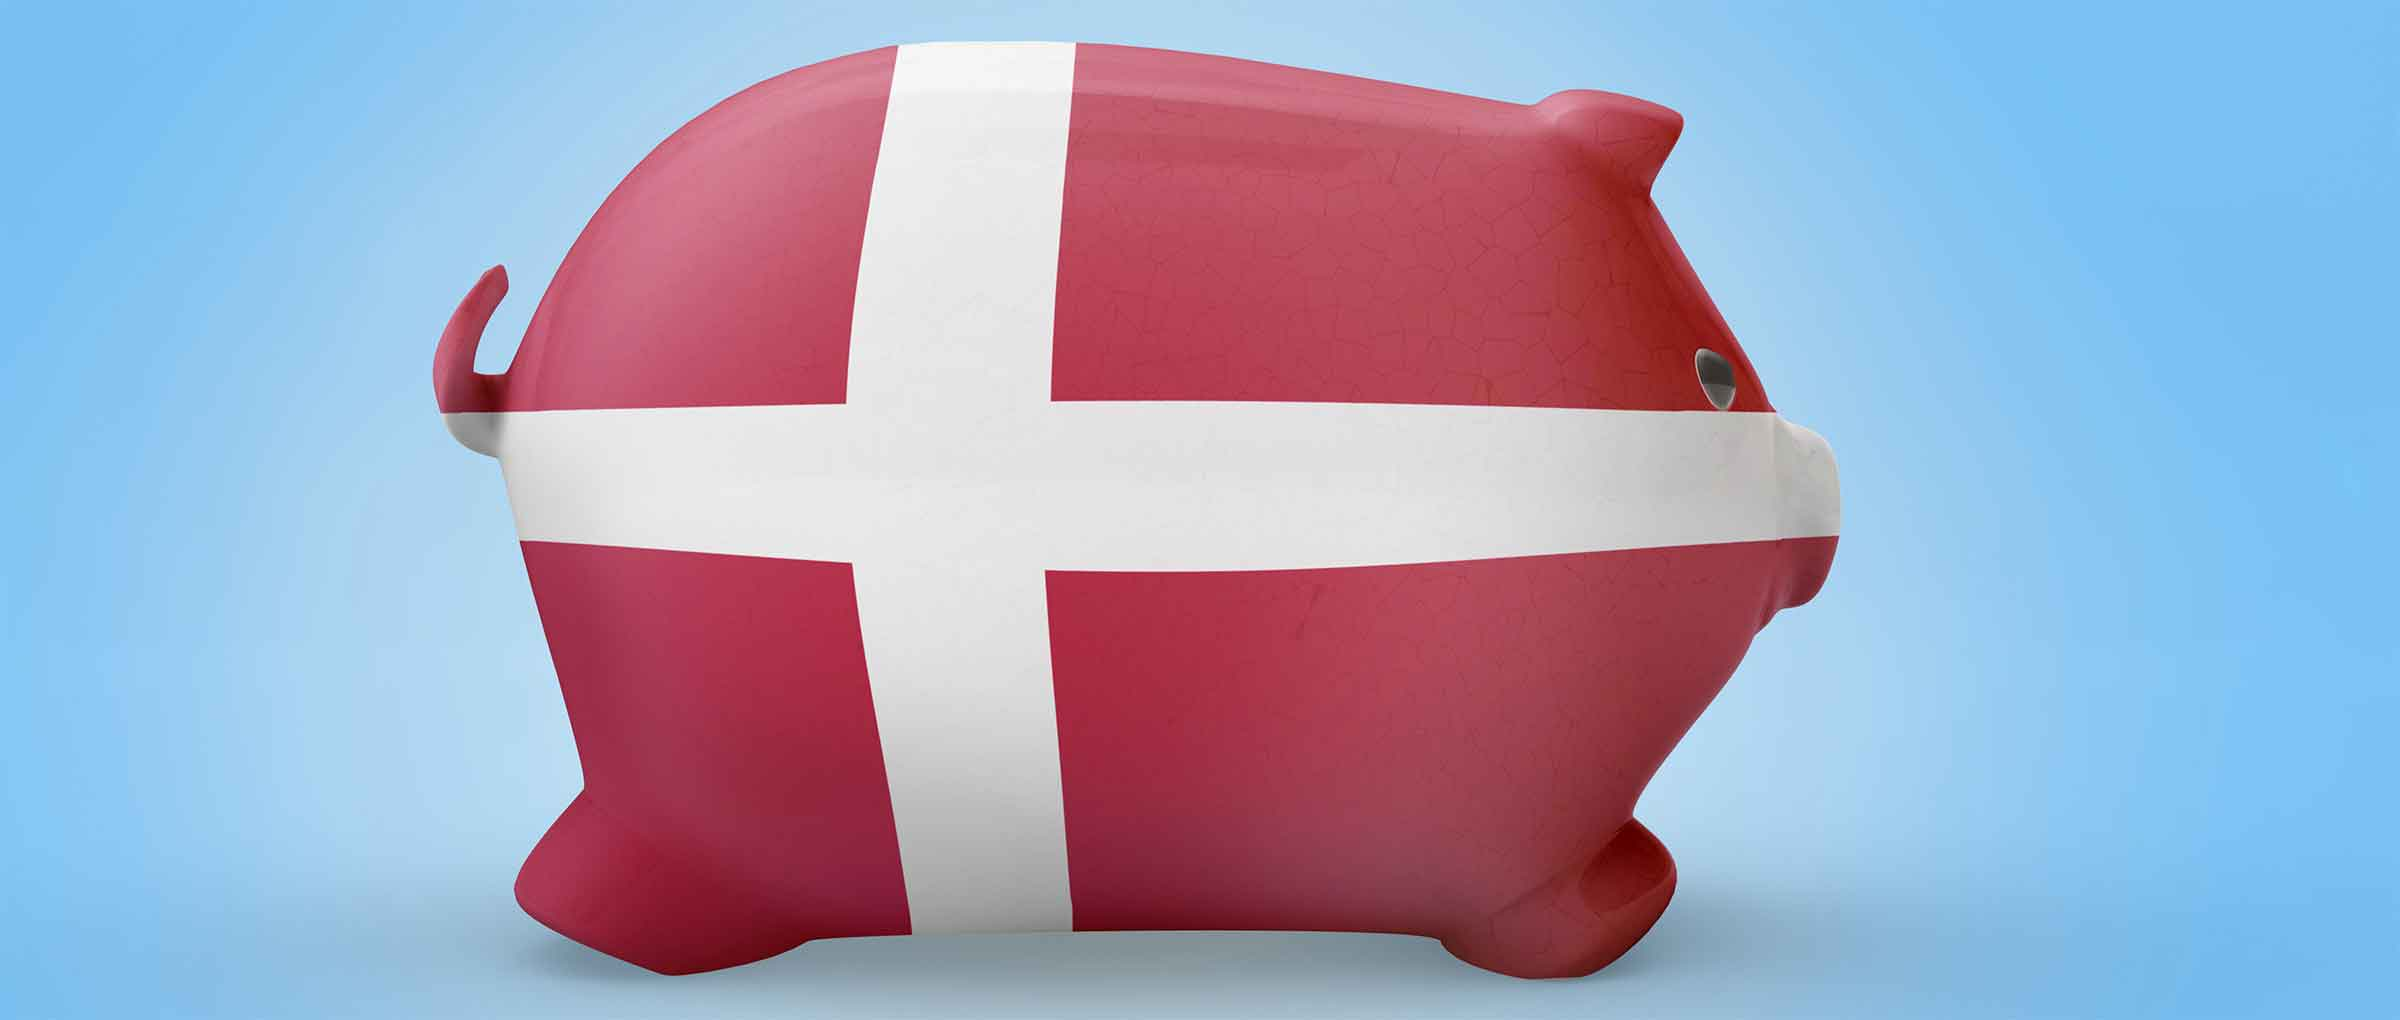 Donor-egg IVF cost in Denmark